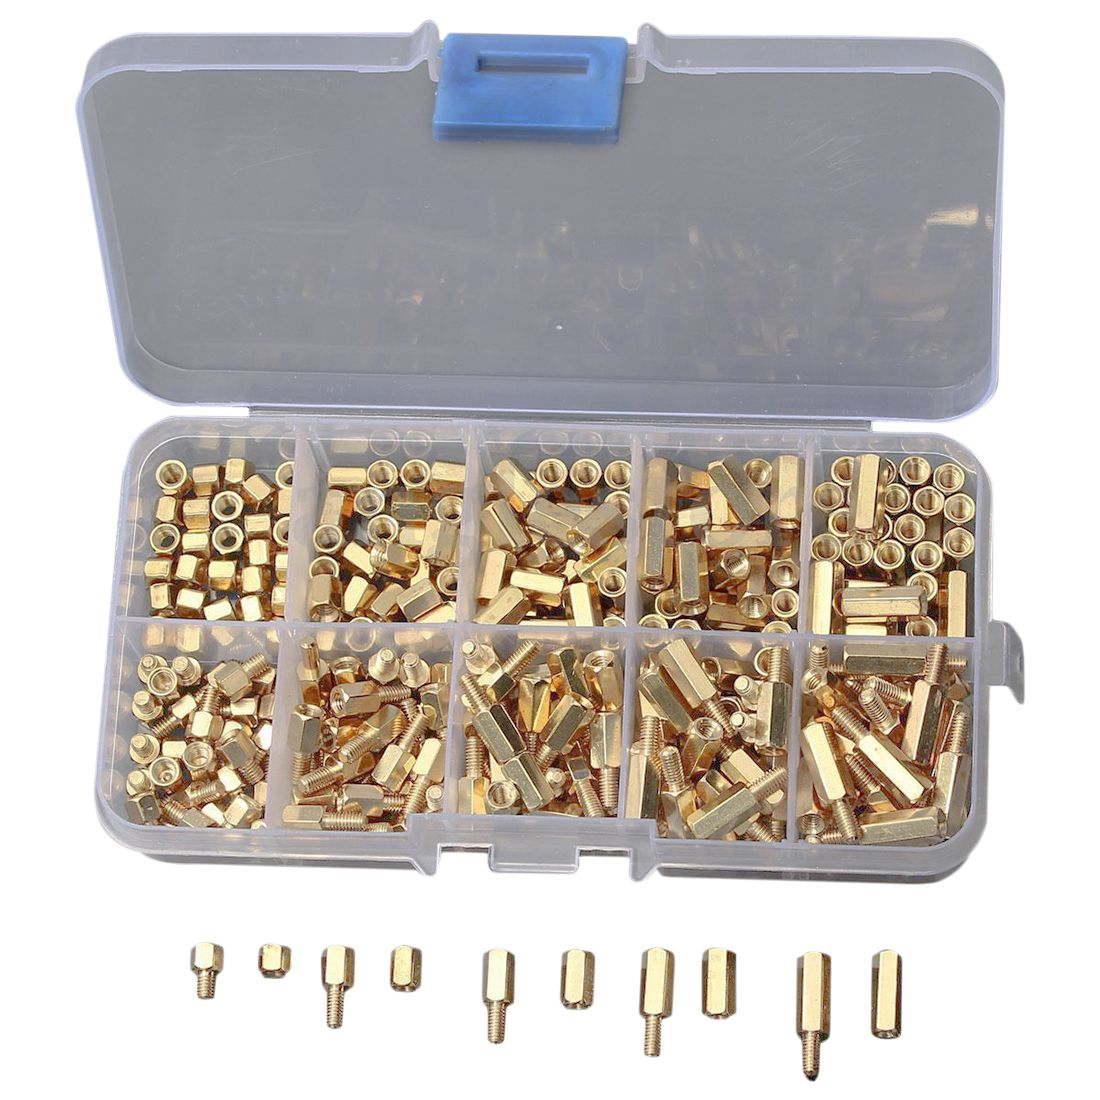 300Pcs/Kit M3 Screw Nut 4-12mm Spacer Hexagonal Brass Isolation Column Threaded Motherboard Standoffs Yellow 10pcs m3 round aluminum alloy long nut studs standoffs fastener 8 10 15 20 25 30 35mm